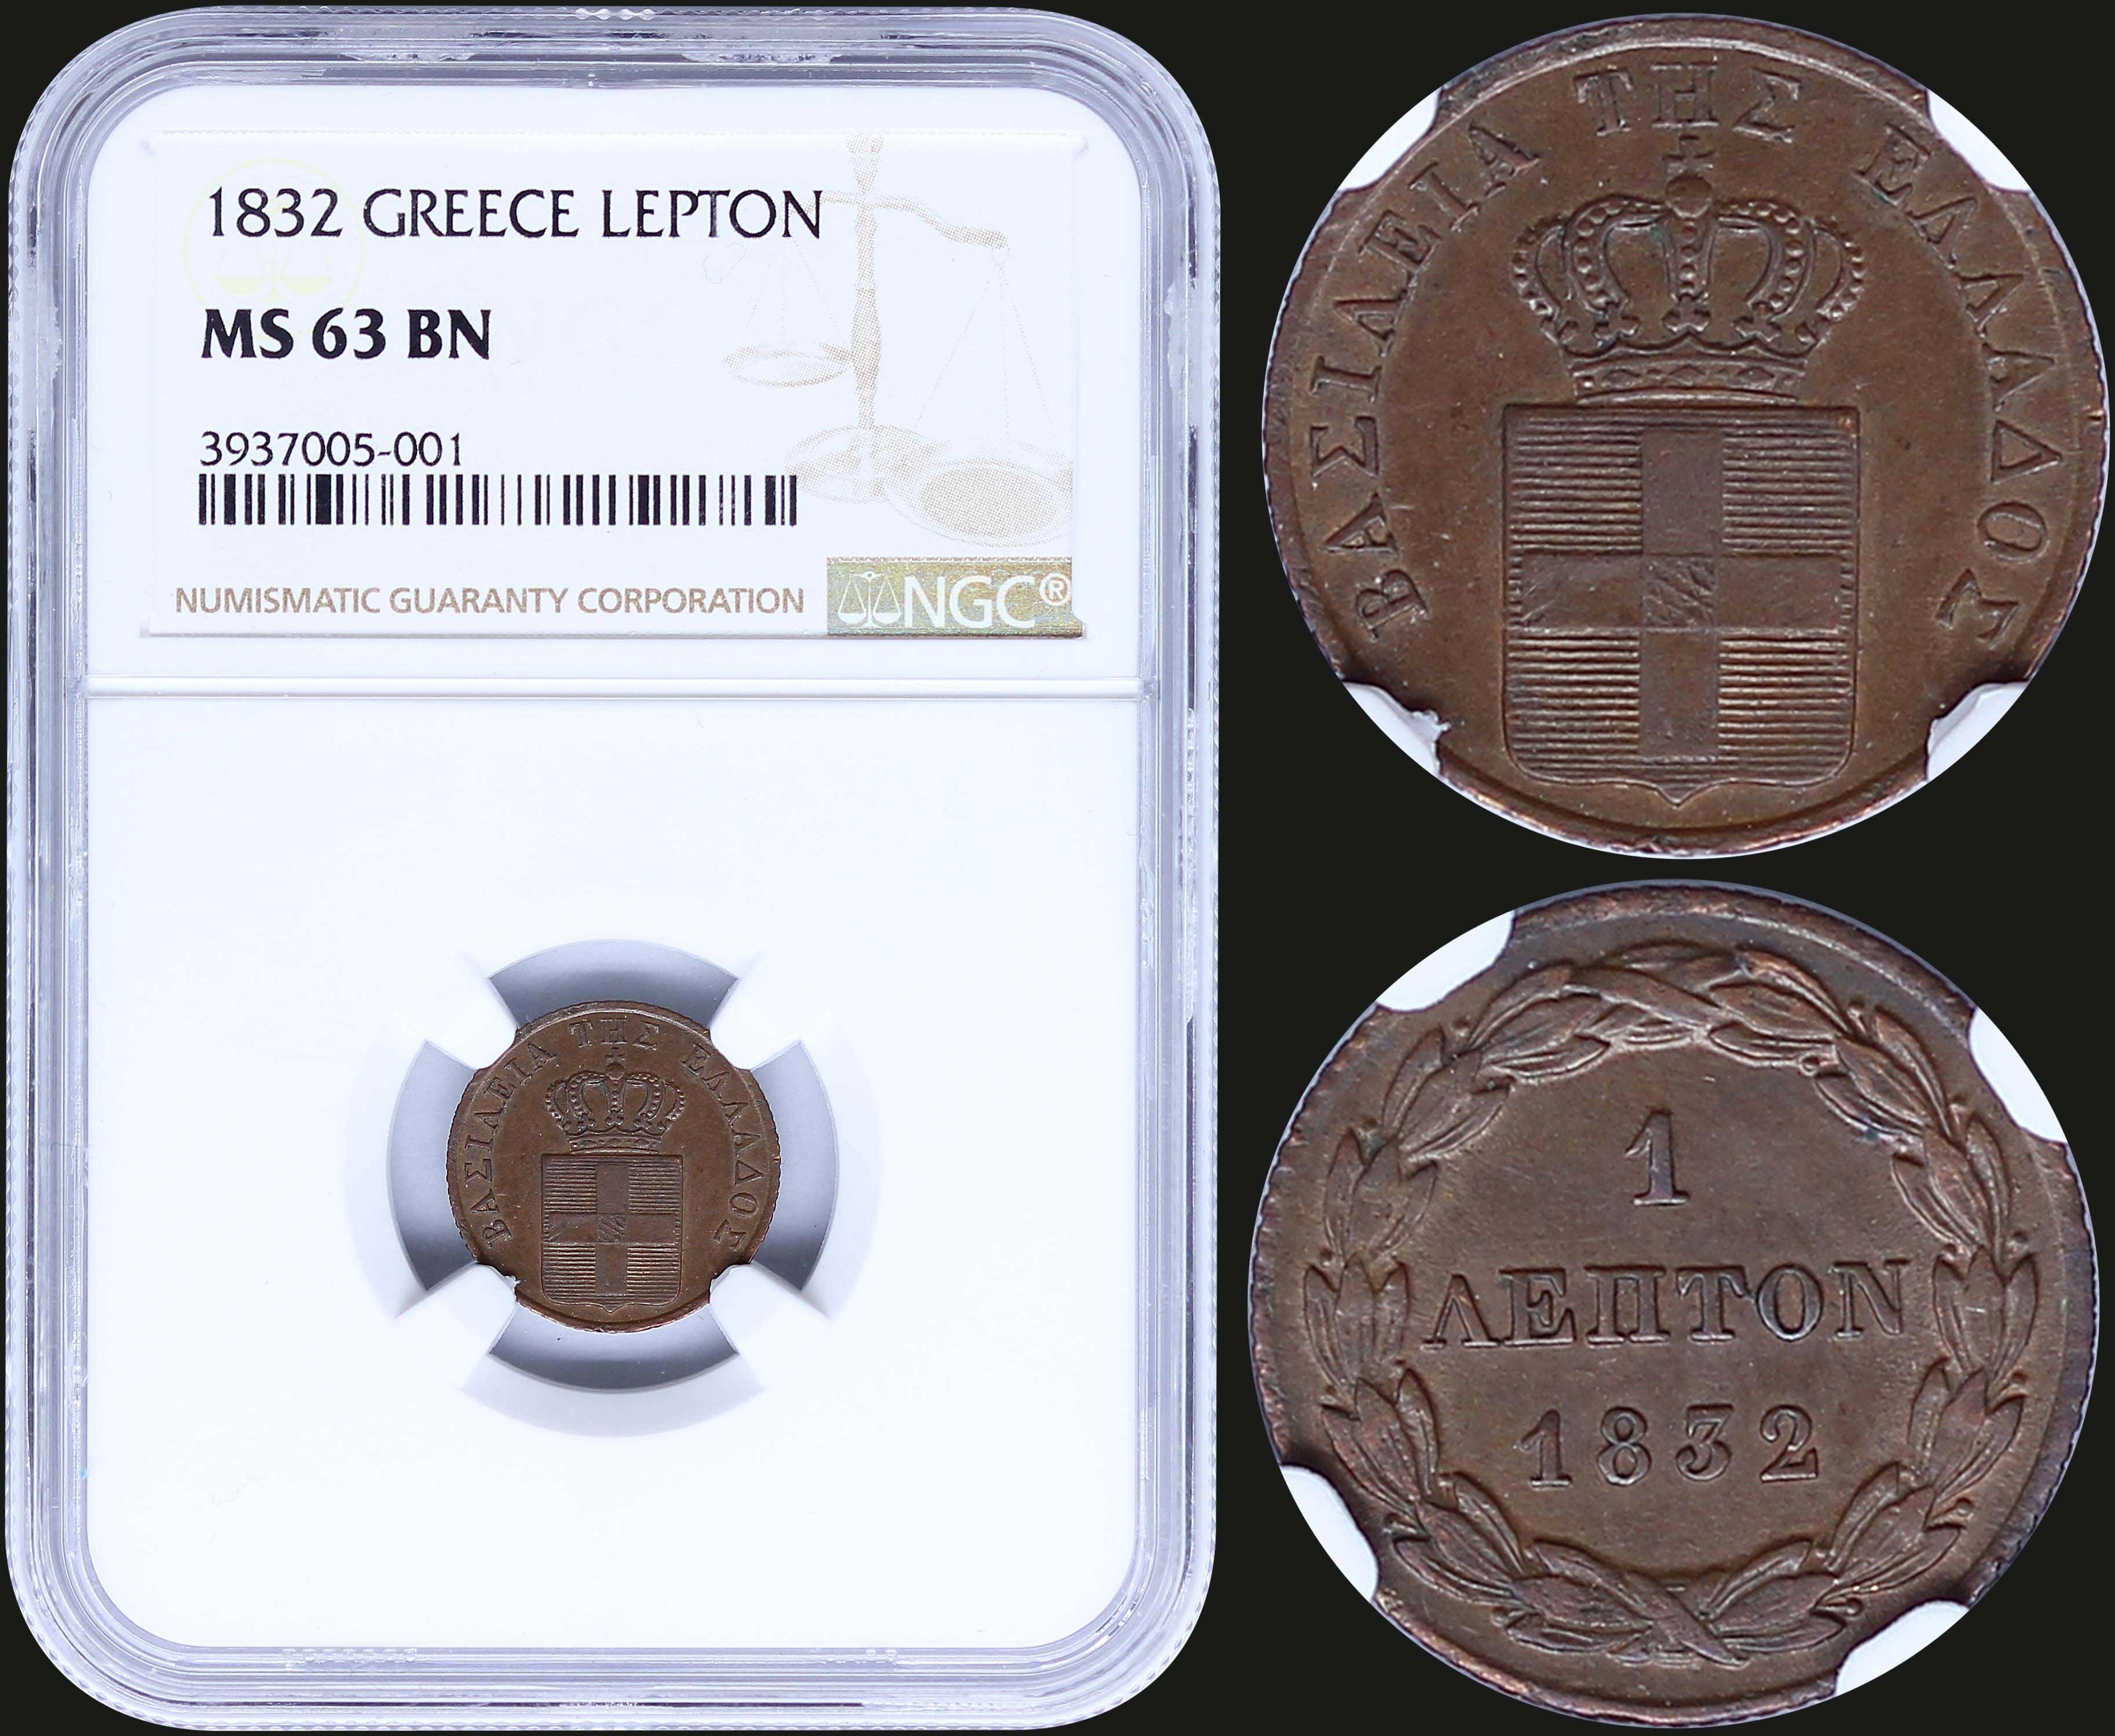 Lot 8070 - -  COINS & TOKENS king otto -  A. Karamitsos Public & Live Bid Auction 644 Coins, Medals & Banknotes